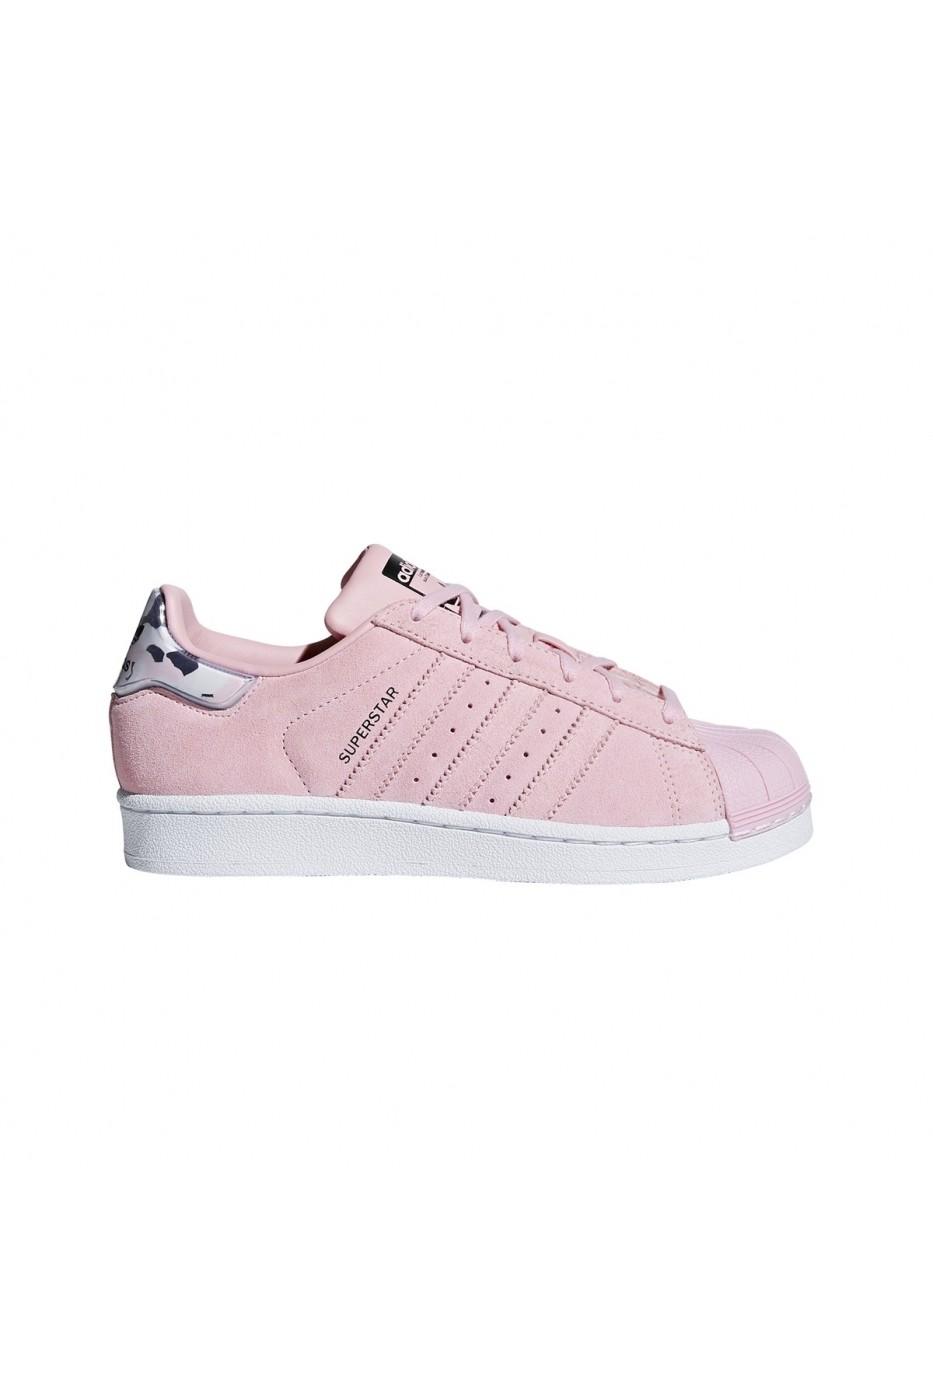 09b026d8d68d Adidas originals Sport cipő LRD-GEY033-pale_pink Rózsaszín - FashionUP!